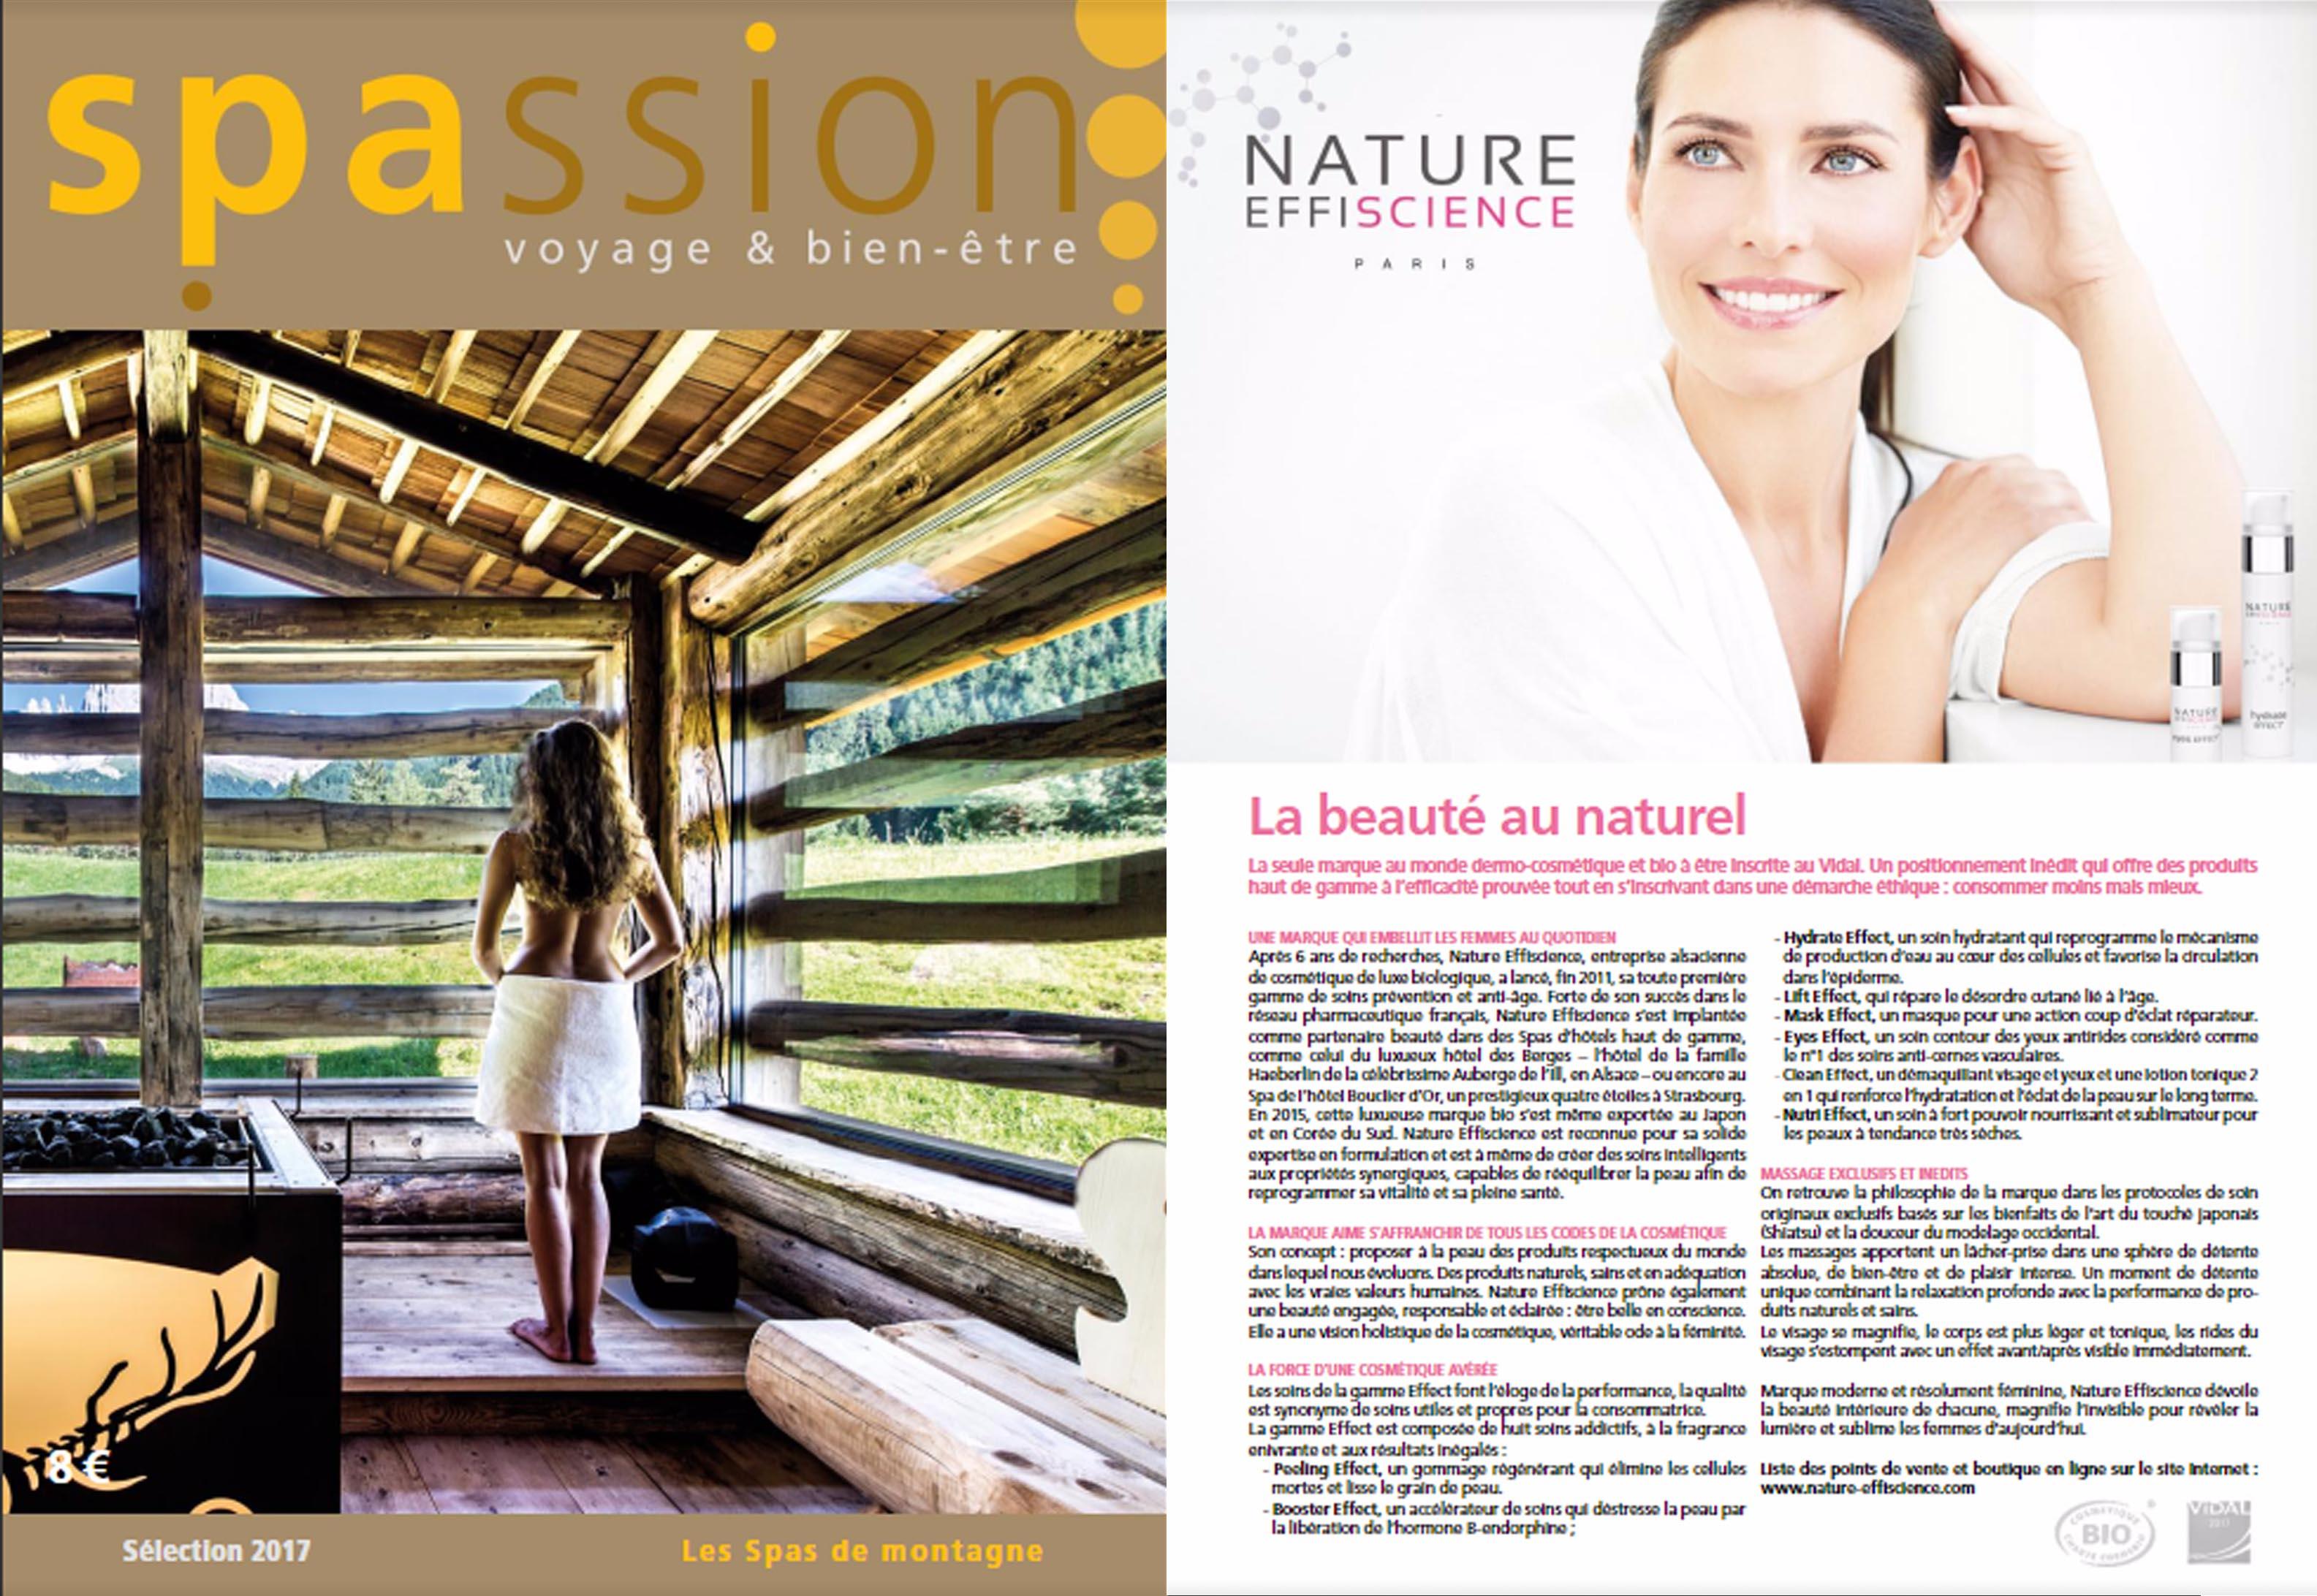 Nature Effiscience dans Spassion magazine